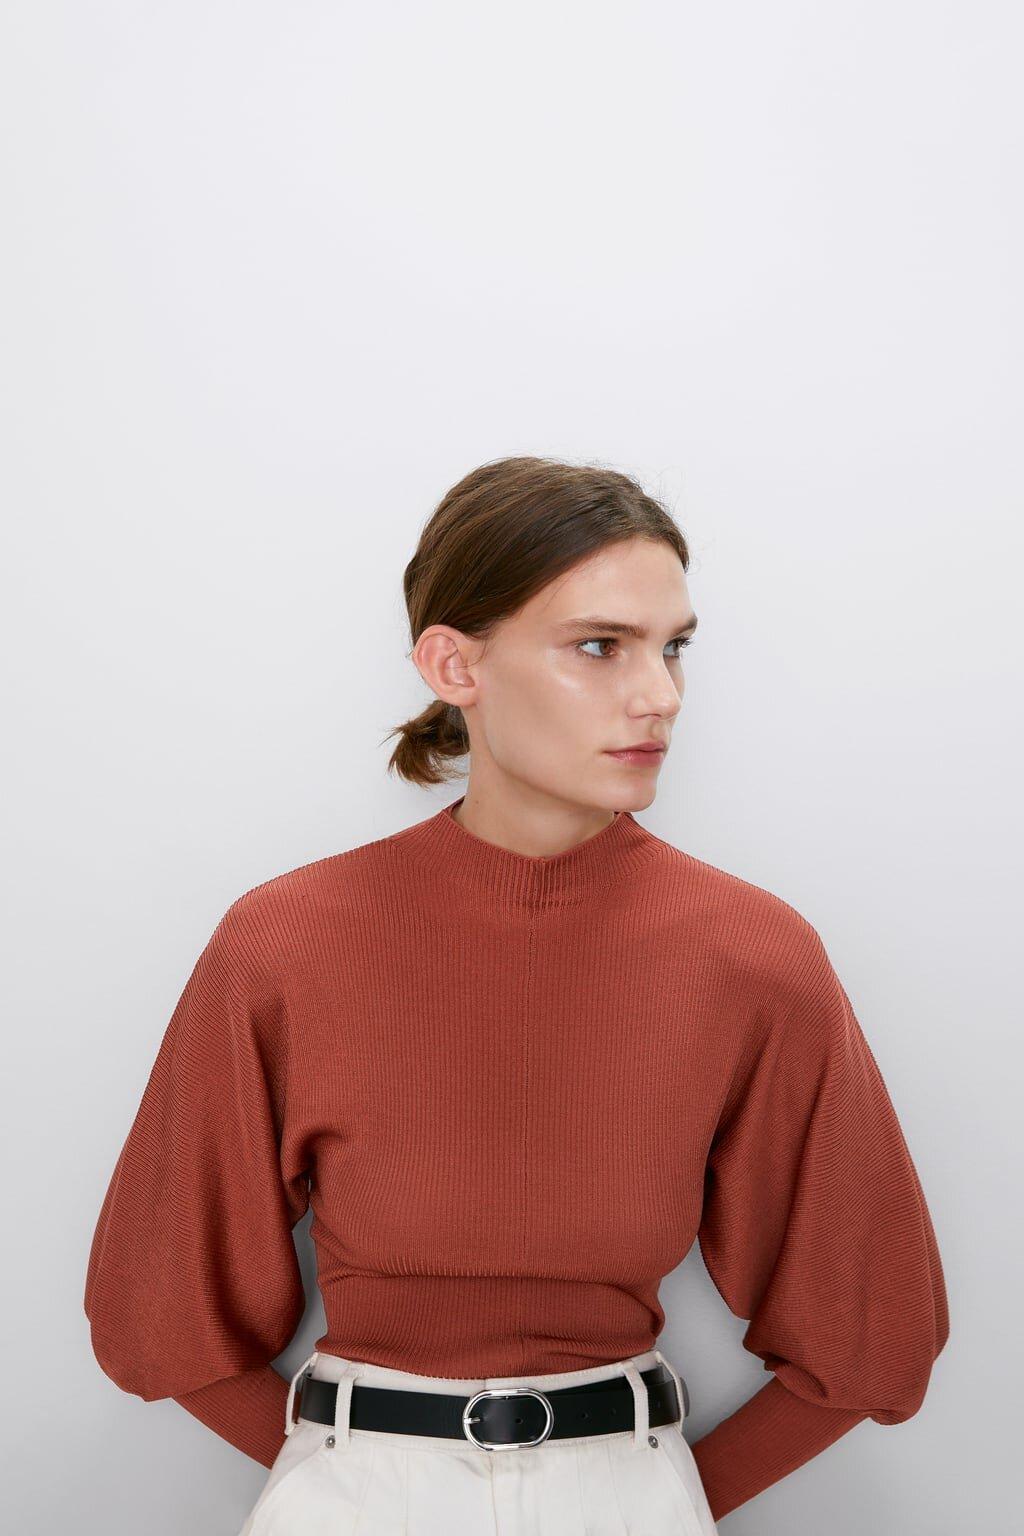 High necked sweater with puffed sleeves, Zara -ú25.99.jpg